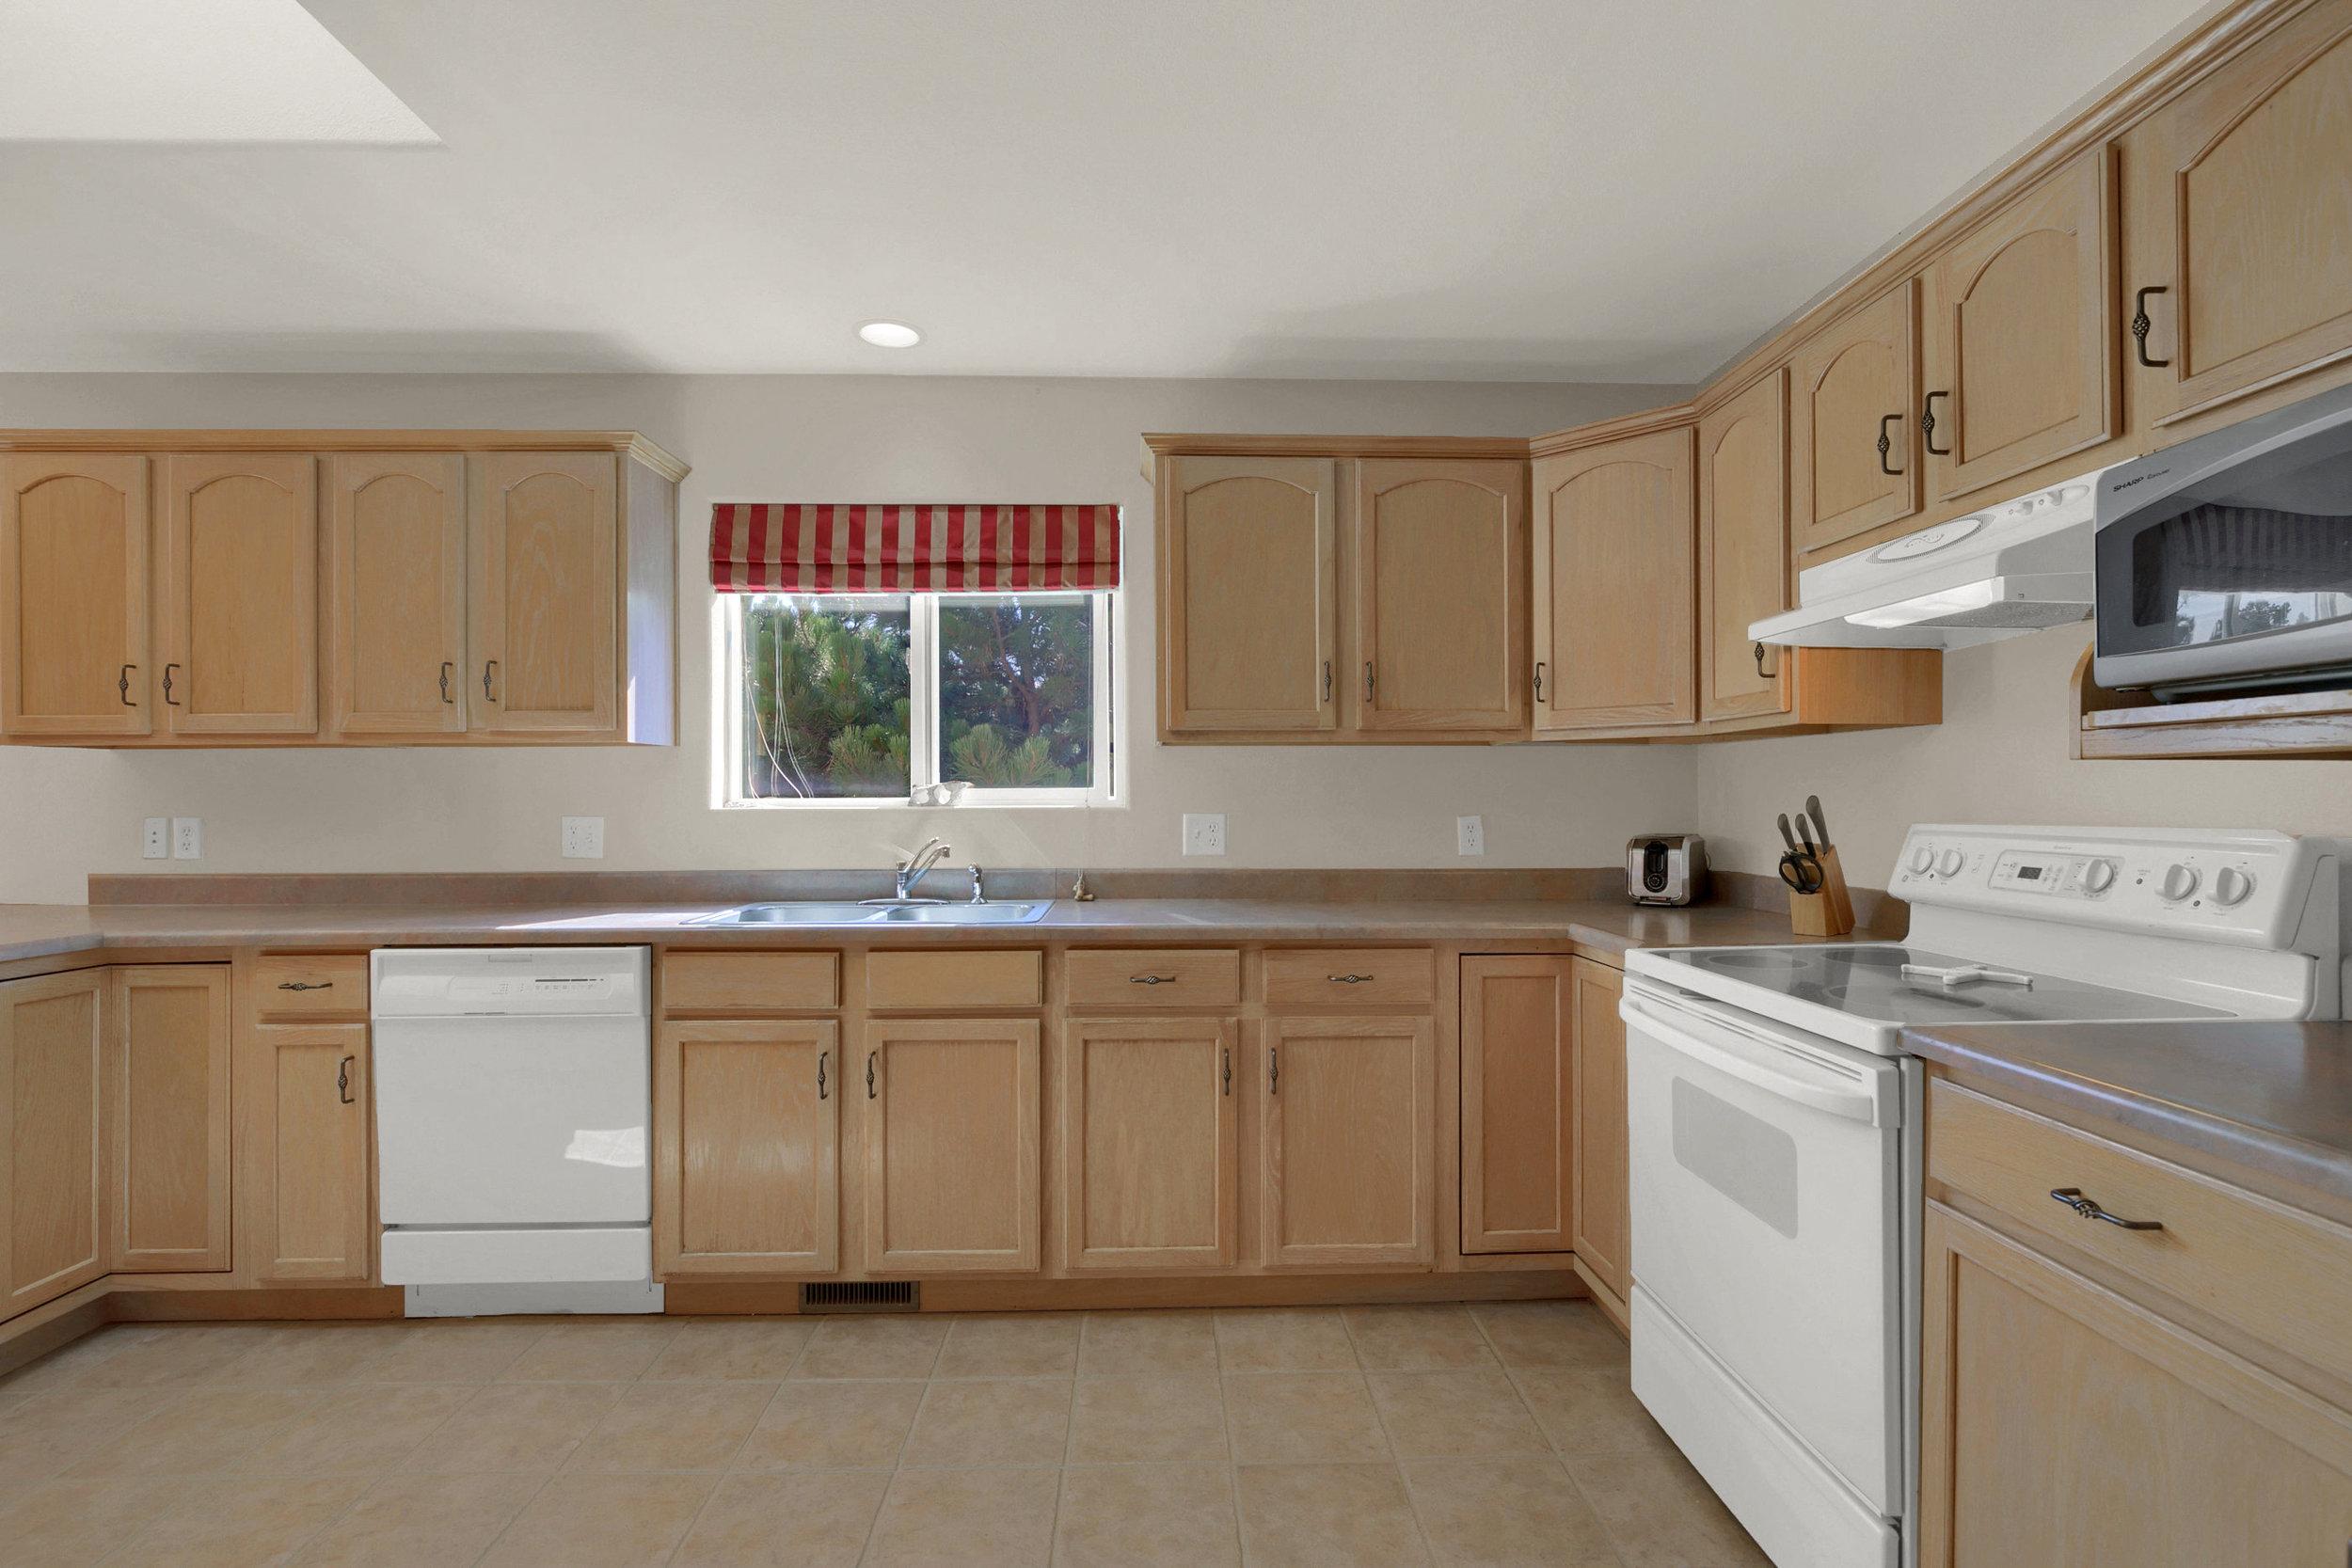 1605 Vickers Drive Colorado-print-012-010-Kitchen-2800x1867-300dpi.jpg